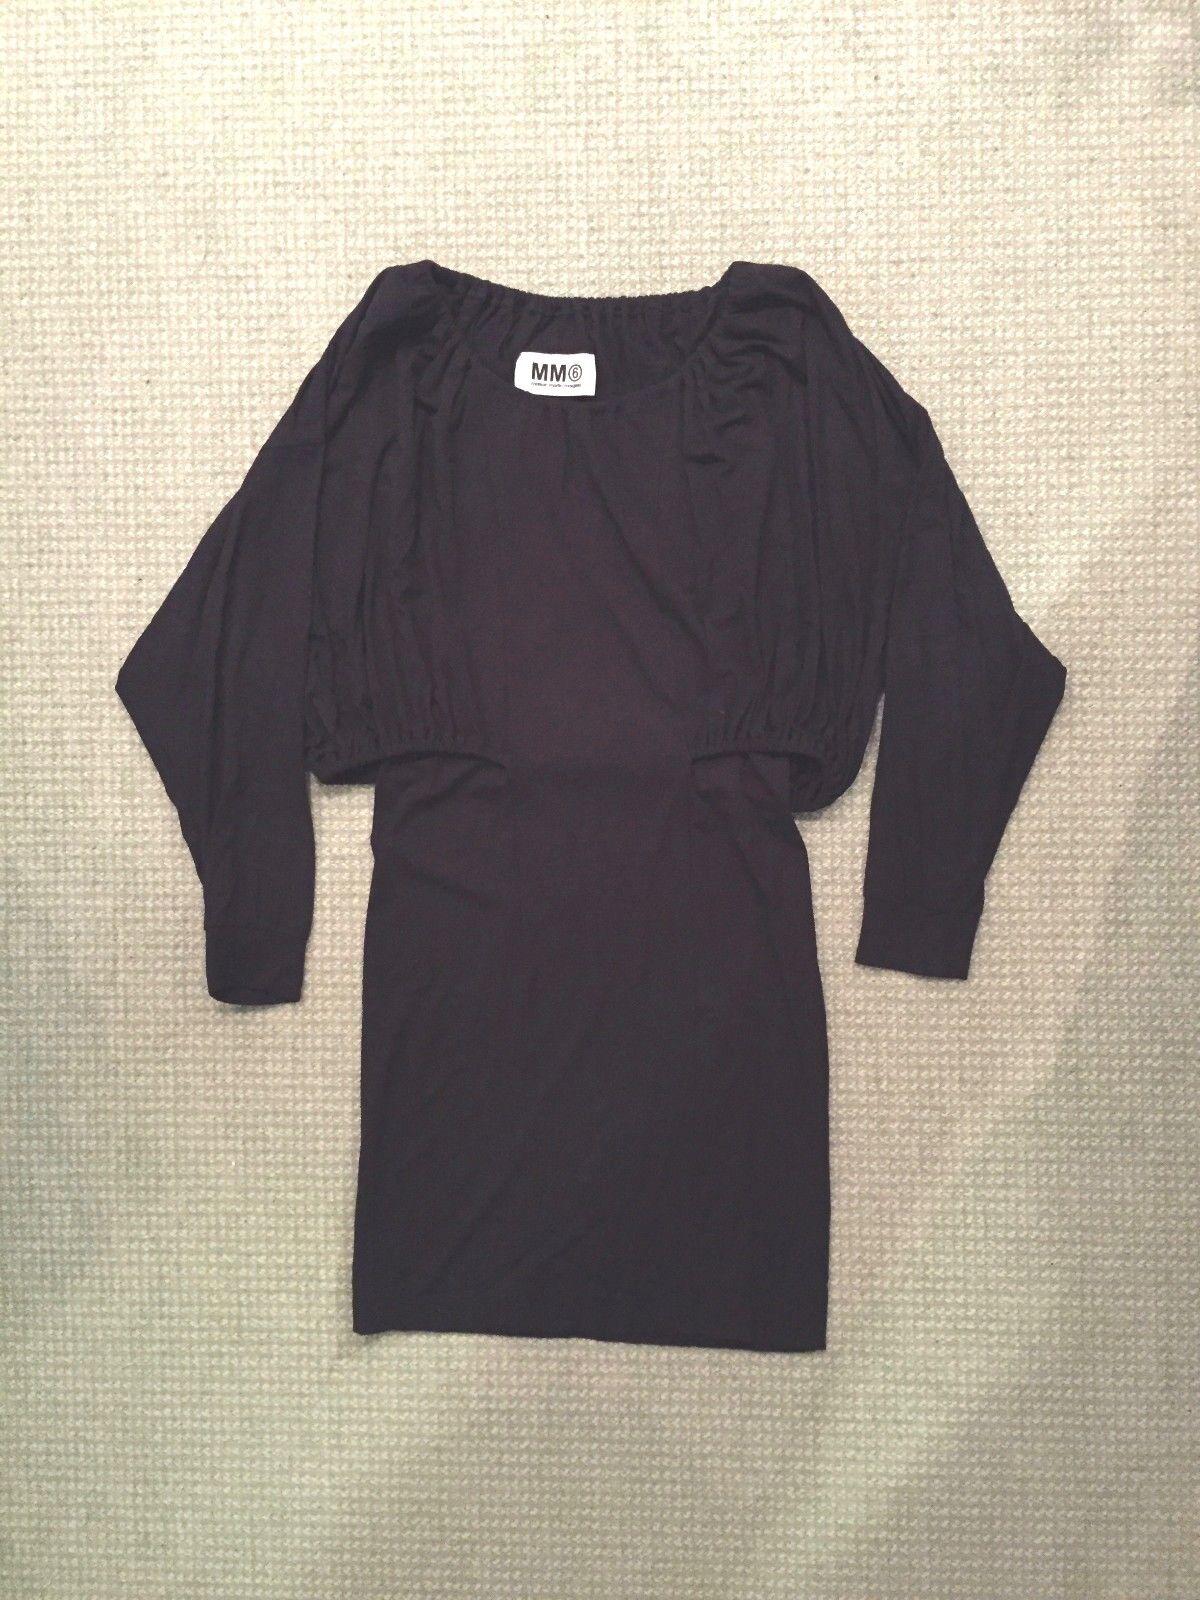 042fef696281 MM6 MAISON MARGIELA nero Dress lunghe (XS) maniche Little npacrf2276-Vestiti